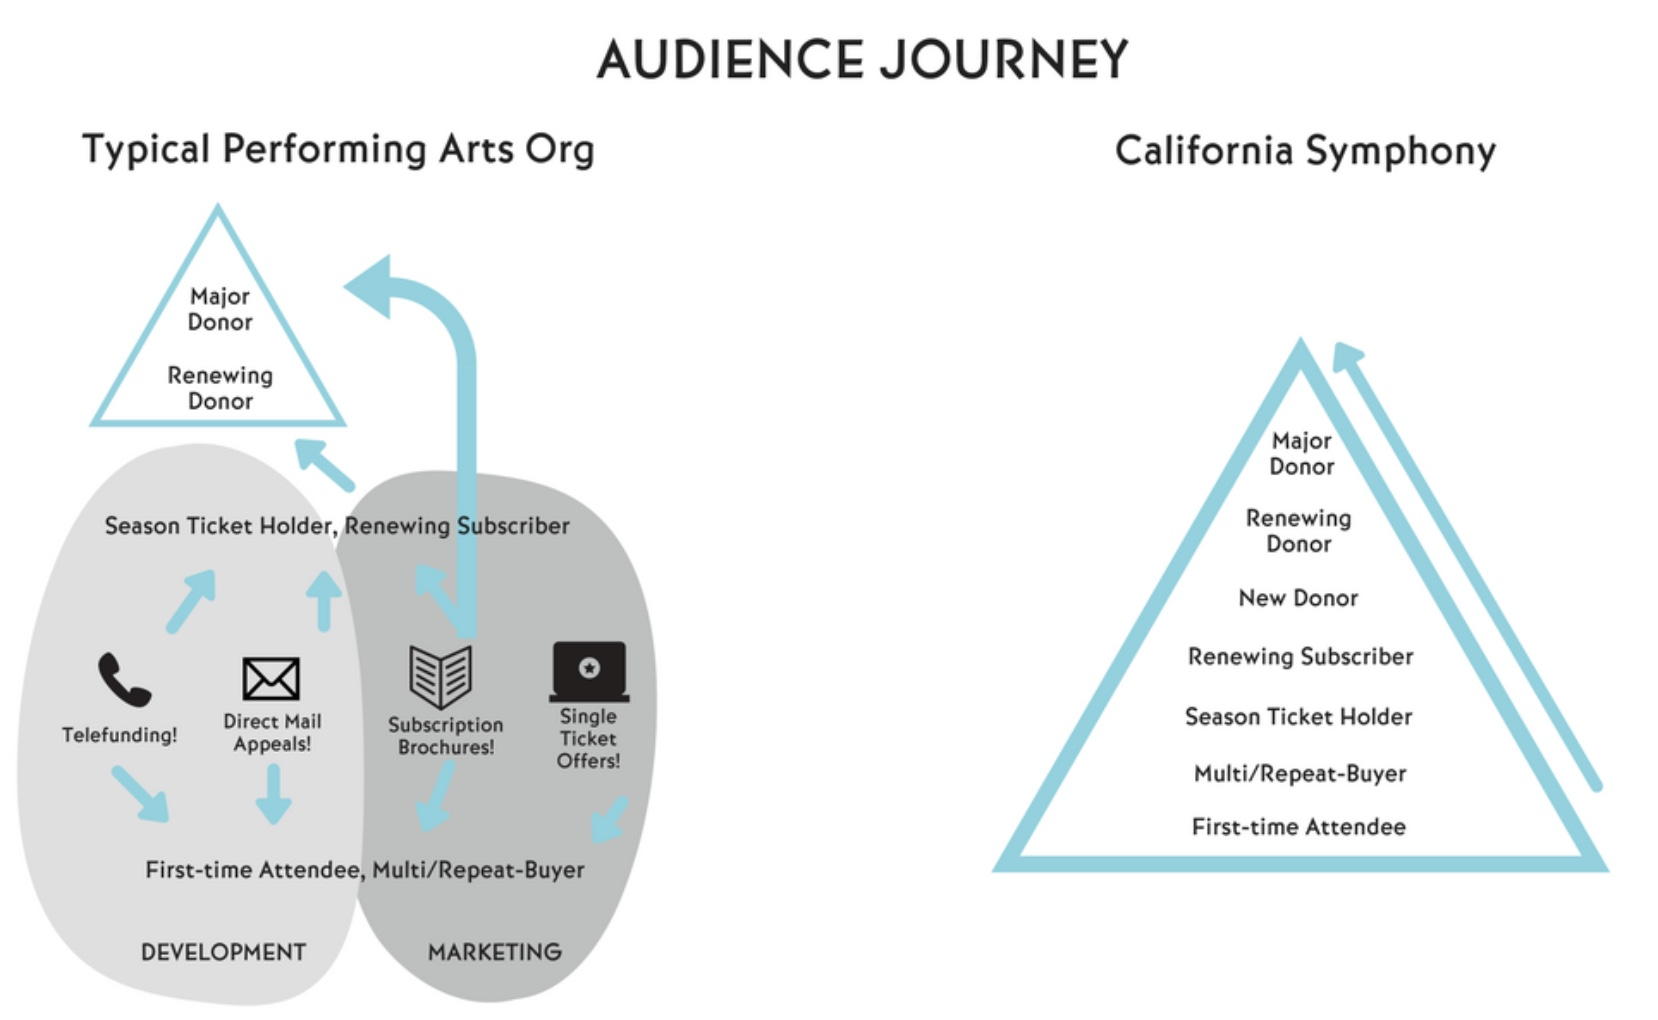 California Symphony's audience journey model. Source:  Aubrey Bergauer